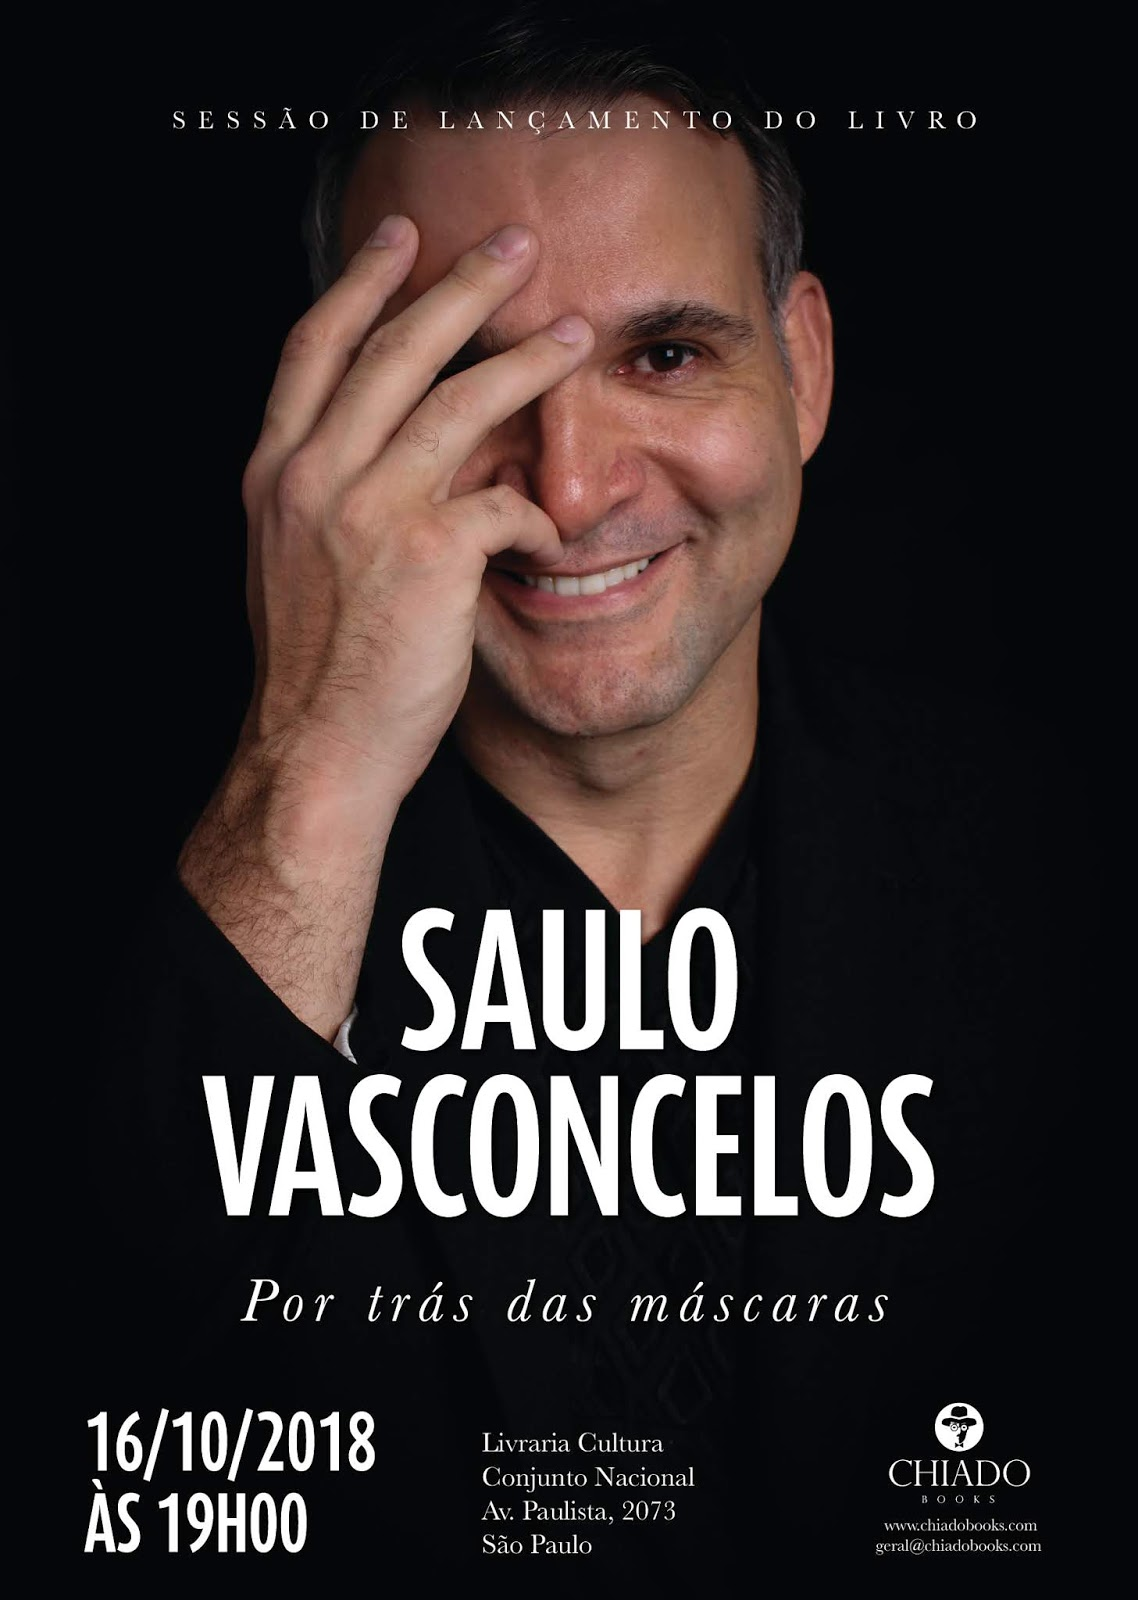 Saulo Vasconcelos lança biografia